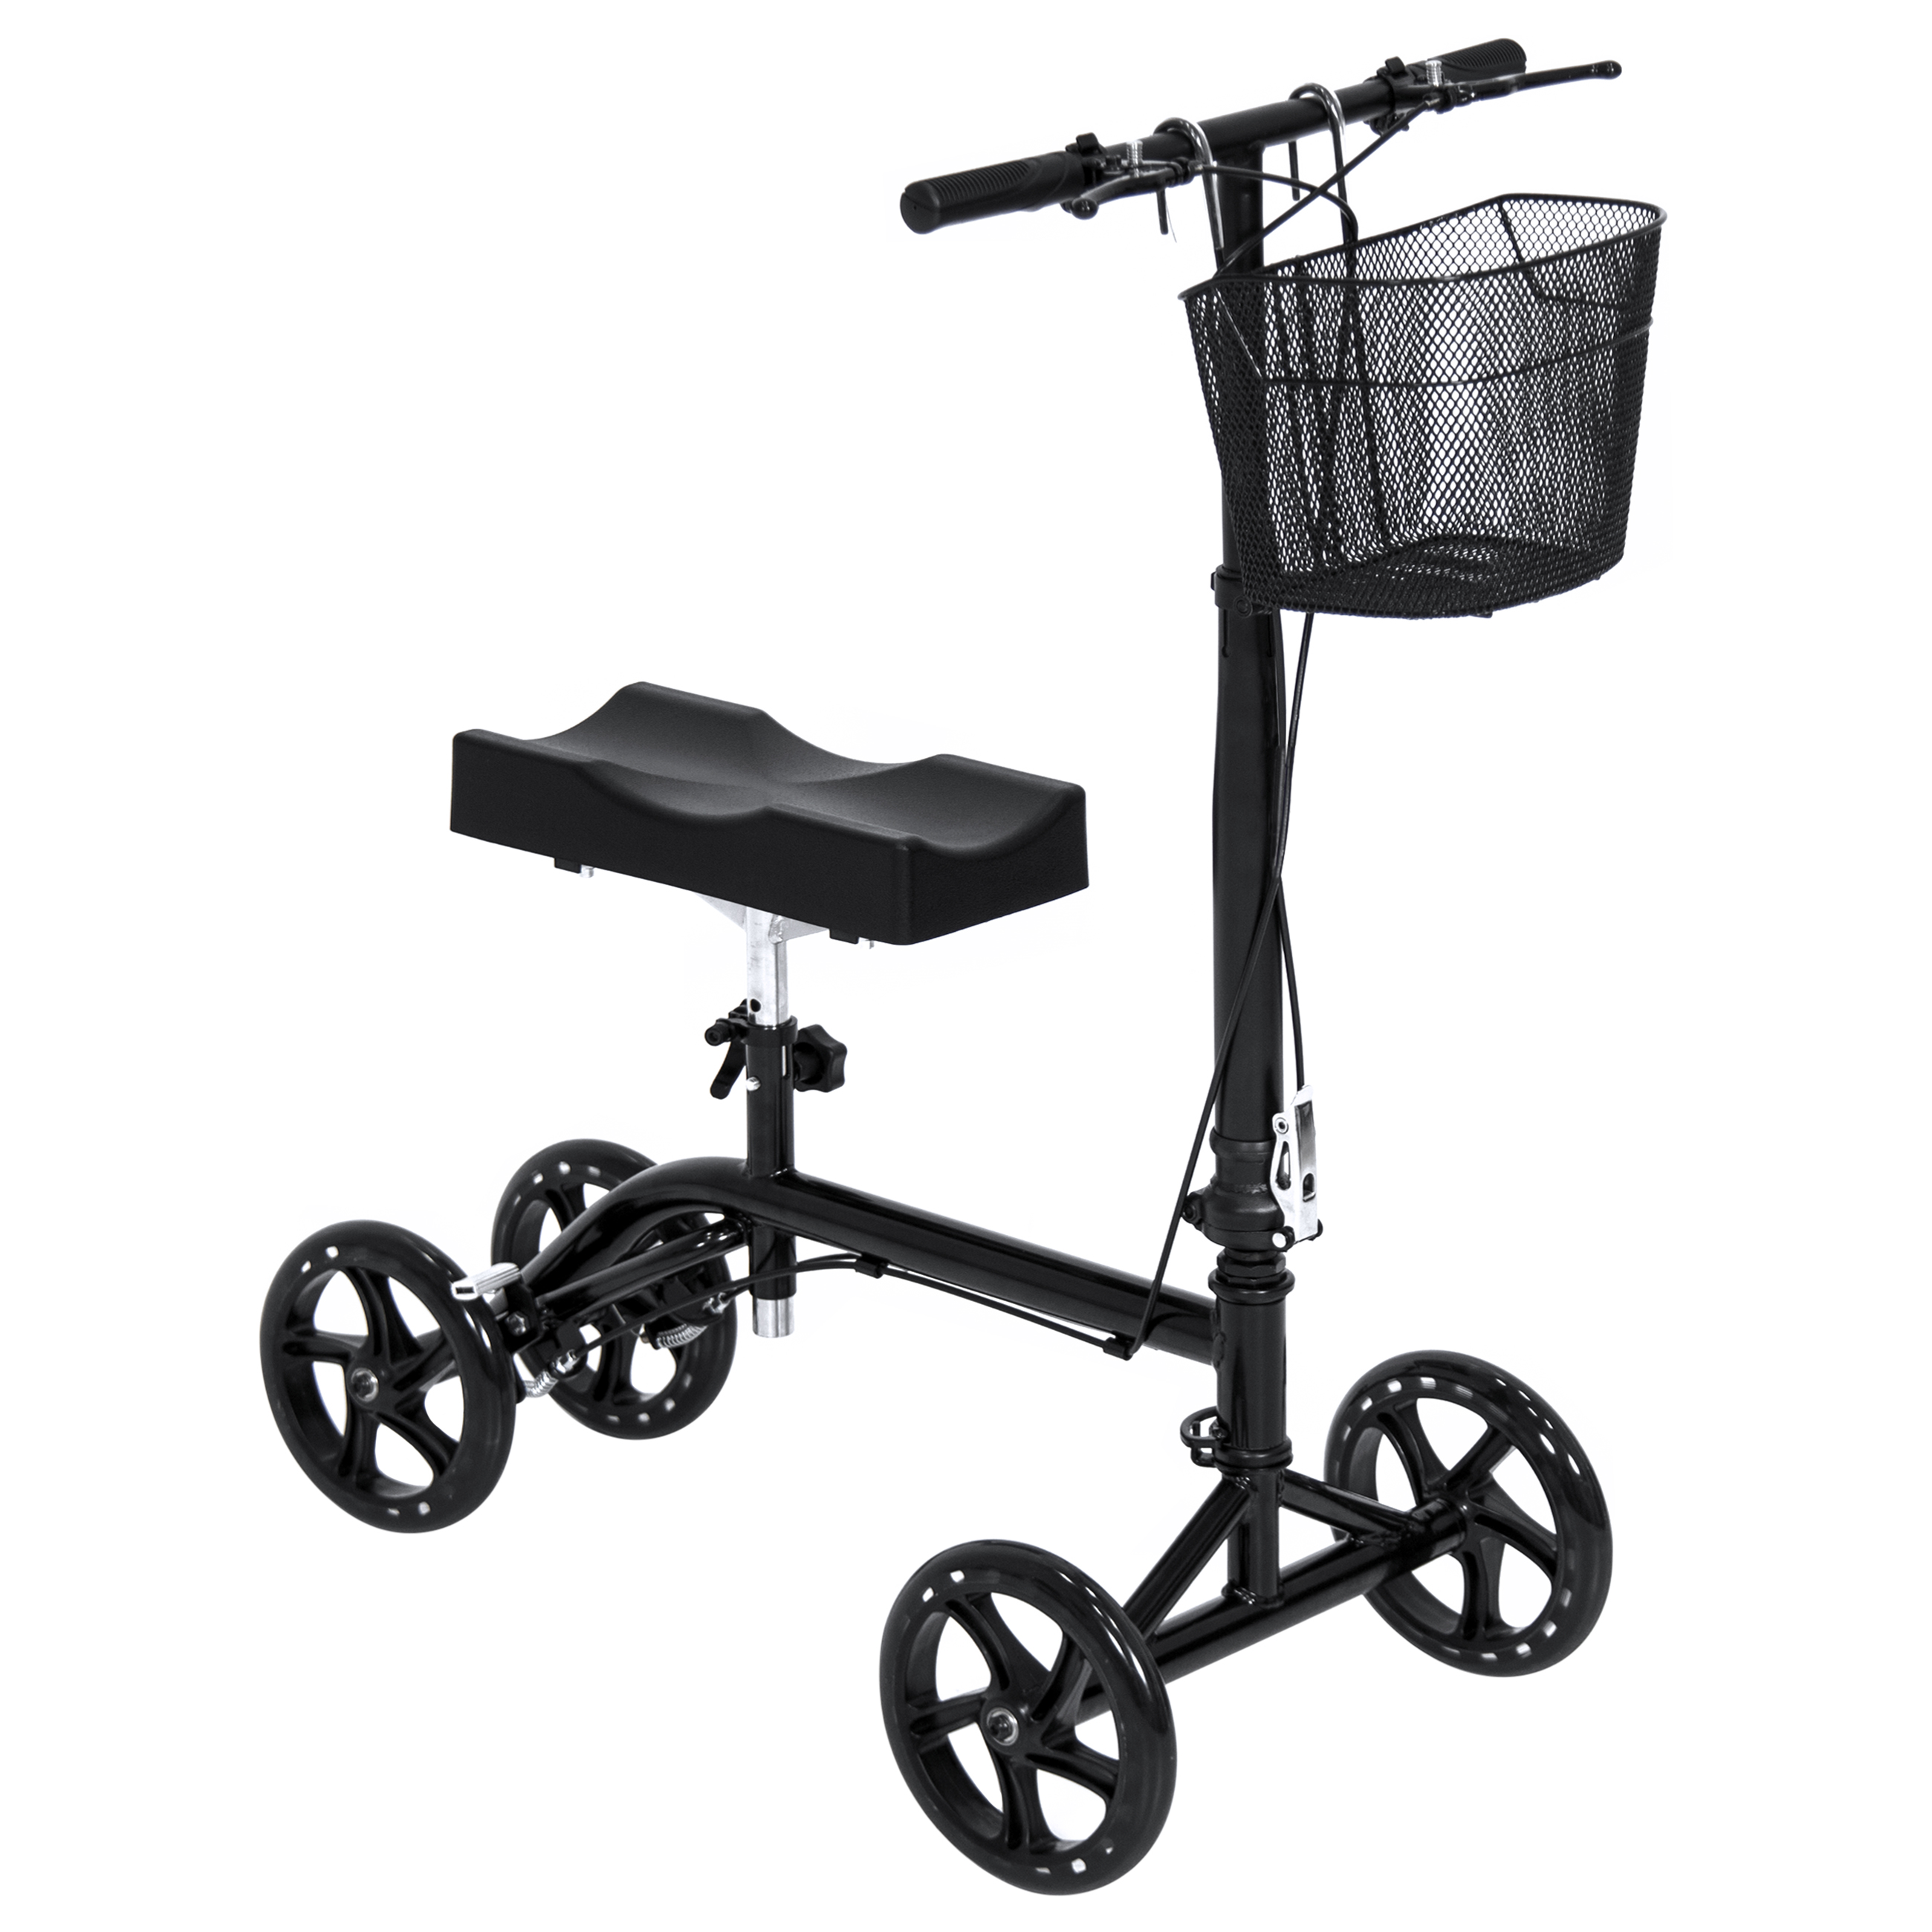 Skytel Knee Walker Scooter Leg Crutch Steerable Turning F...